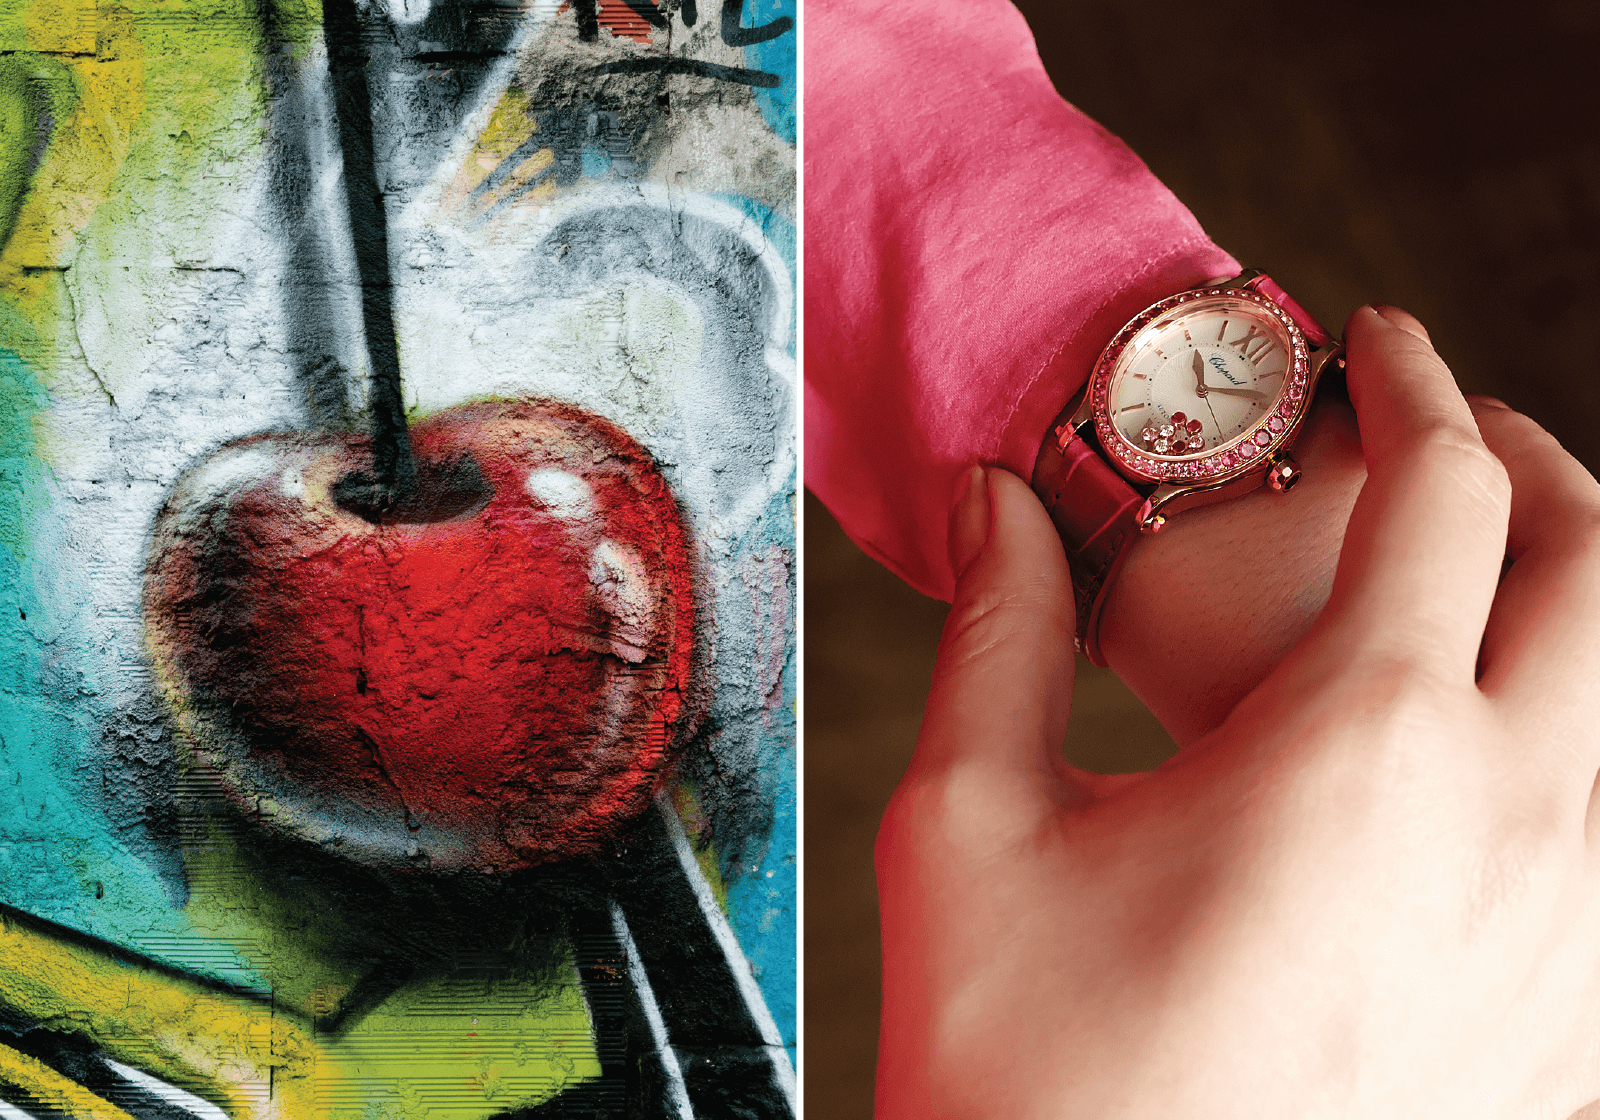 Chopard | Happy Sport Oval | Ref . 275362-5003 Corda automática | Ouro rosa | 31.31 x 29 mm | Relógio cedido por Torres Joalheiros © Paulo Pires / Espiral do Tempo